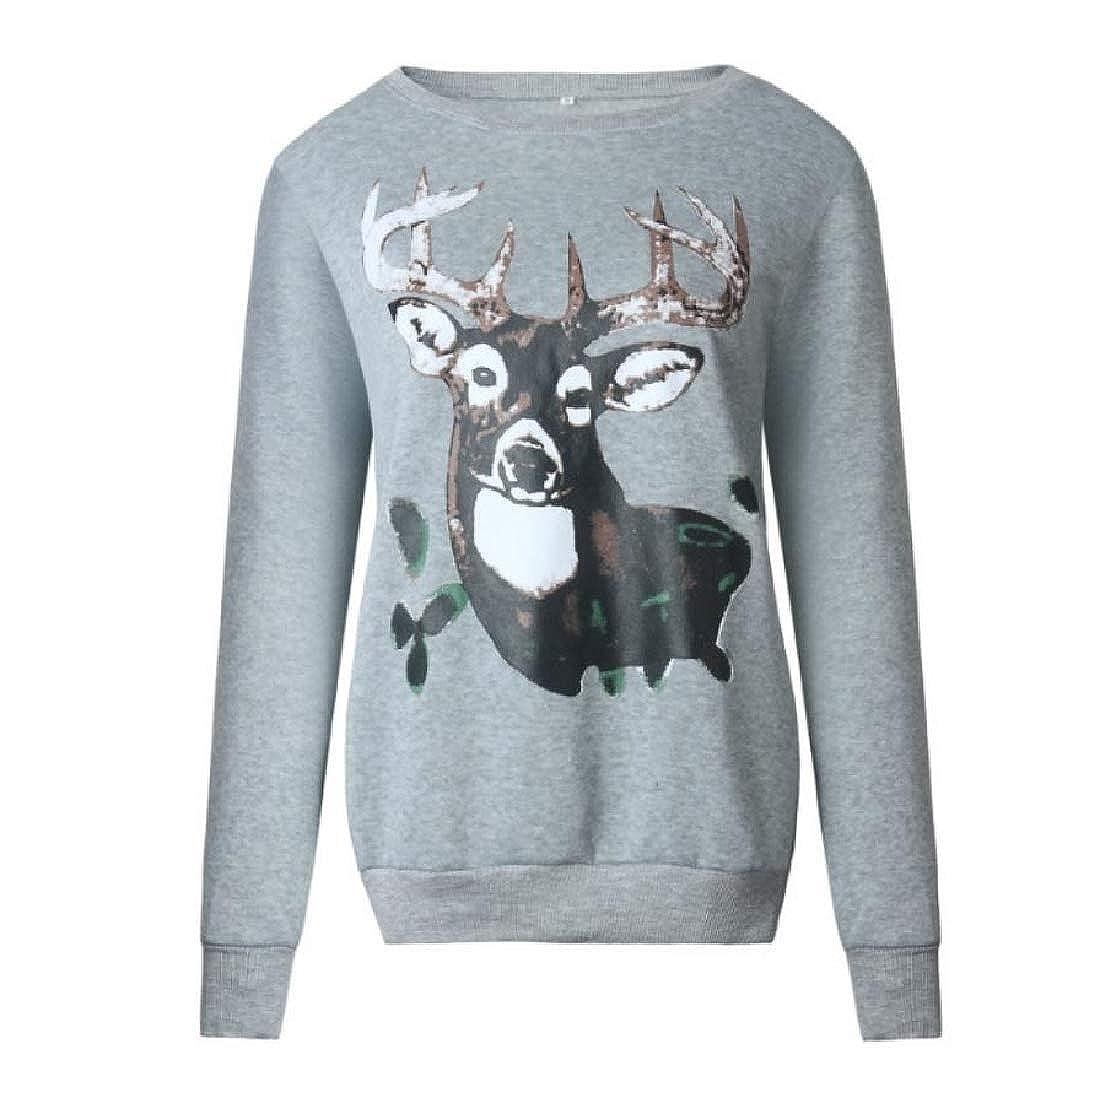 YUNY Women Reindeer Merry Christmas Sweatshirt Outdoors Outwear Tops Grey L